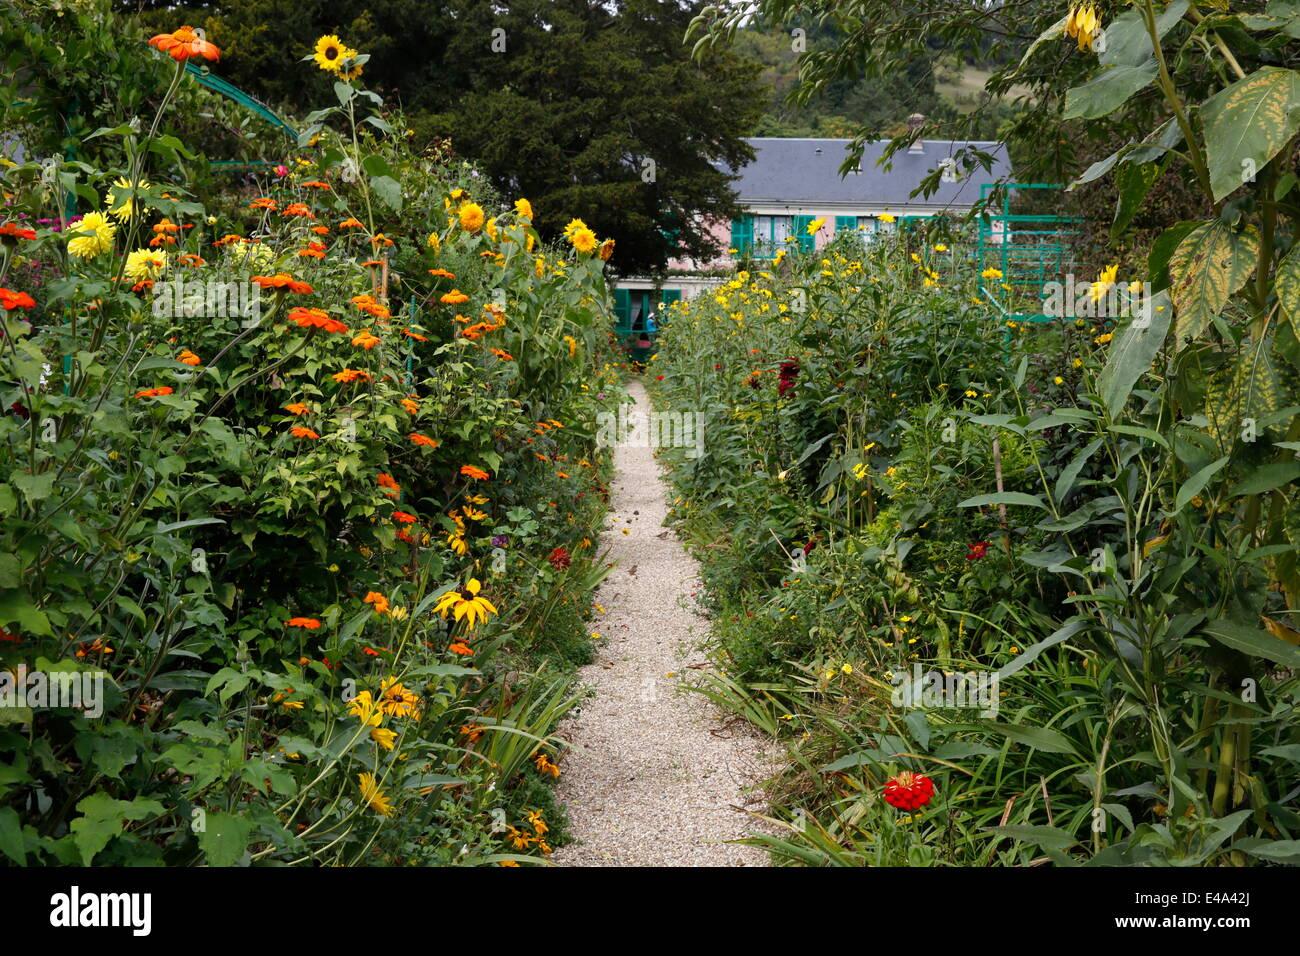 Monet-Garten in Giverny, Yvelines, Normandie, Frankreich, Europa Stockbild